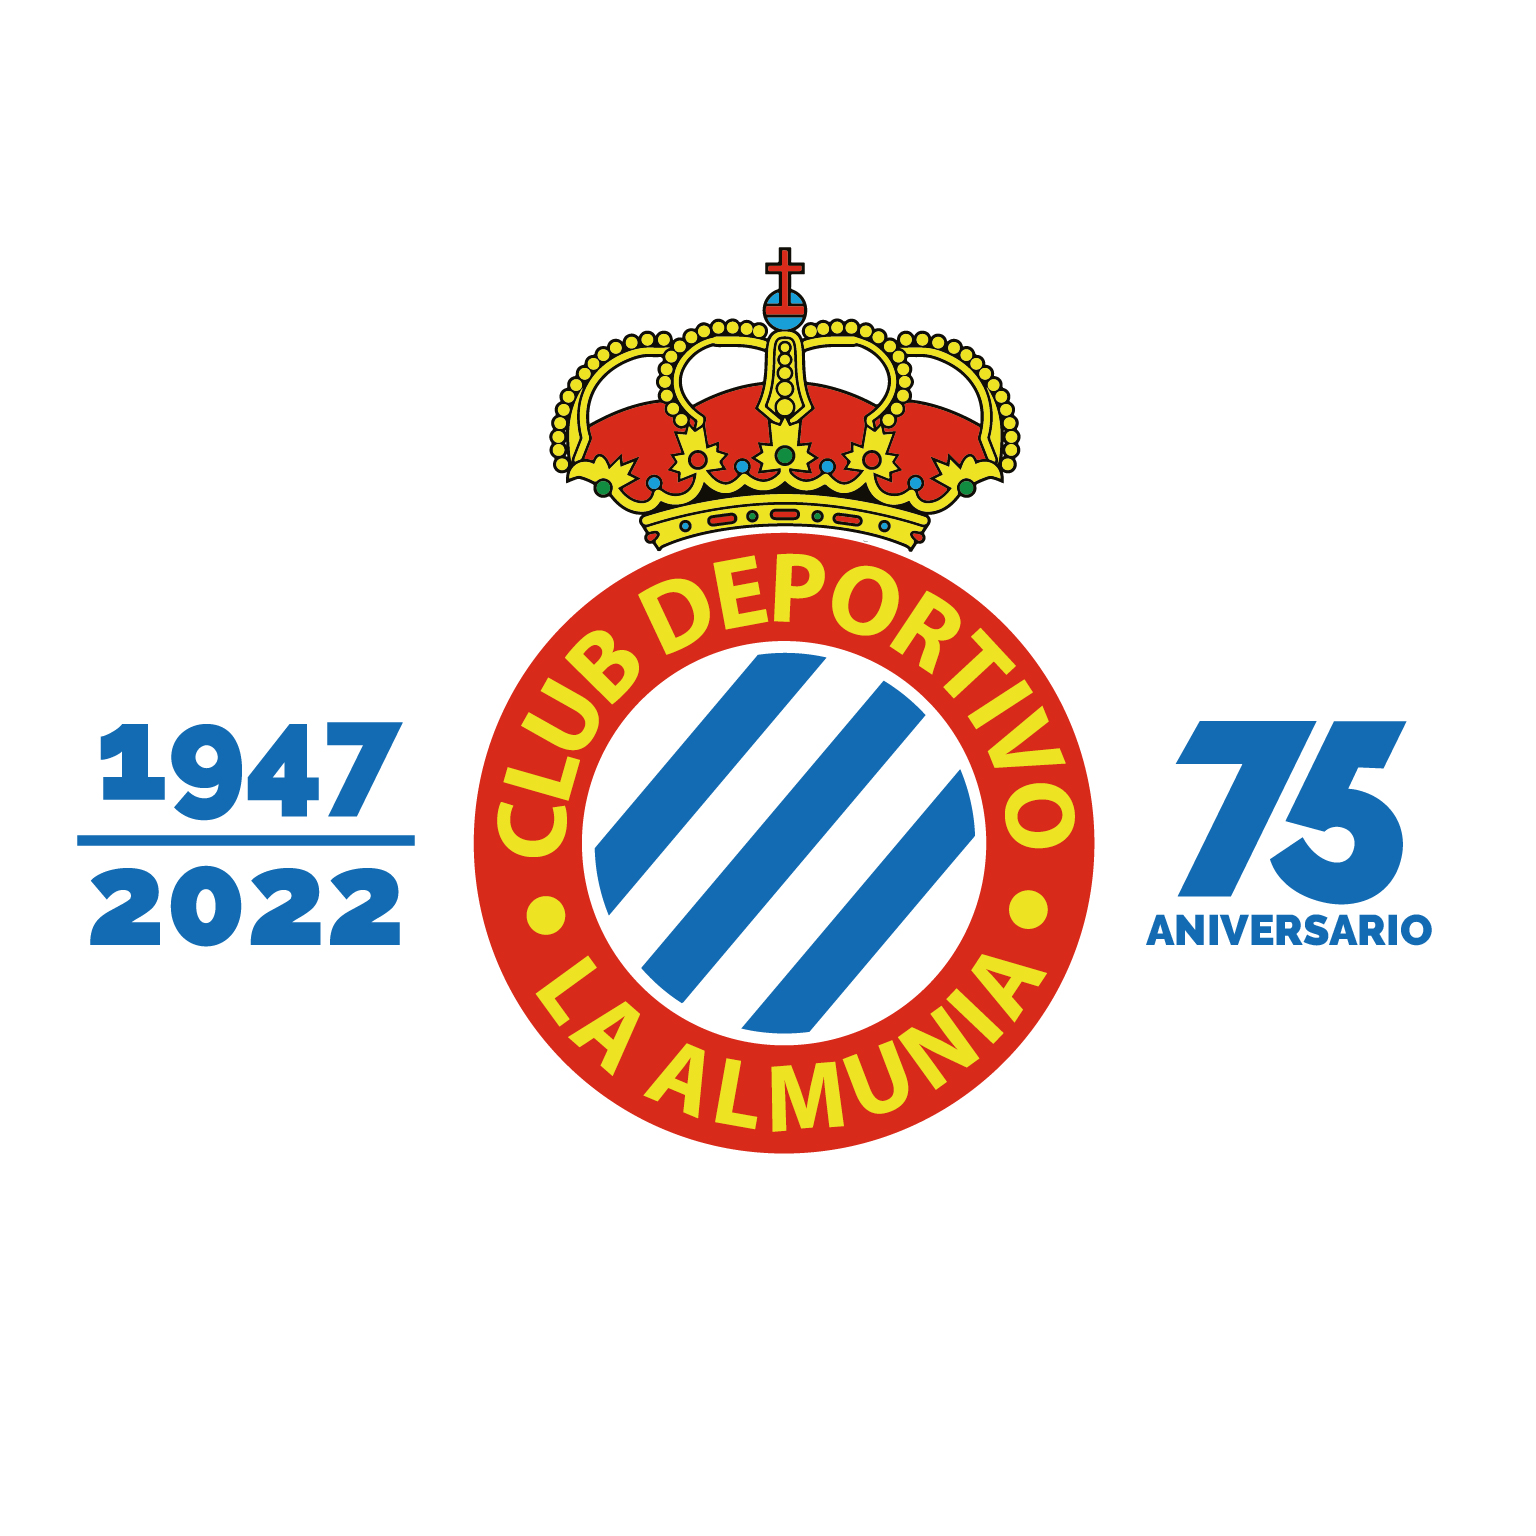 75 aniversario CD La Almunia